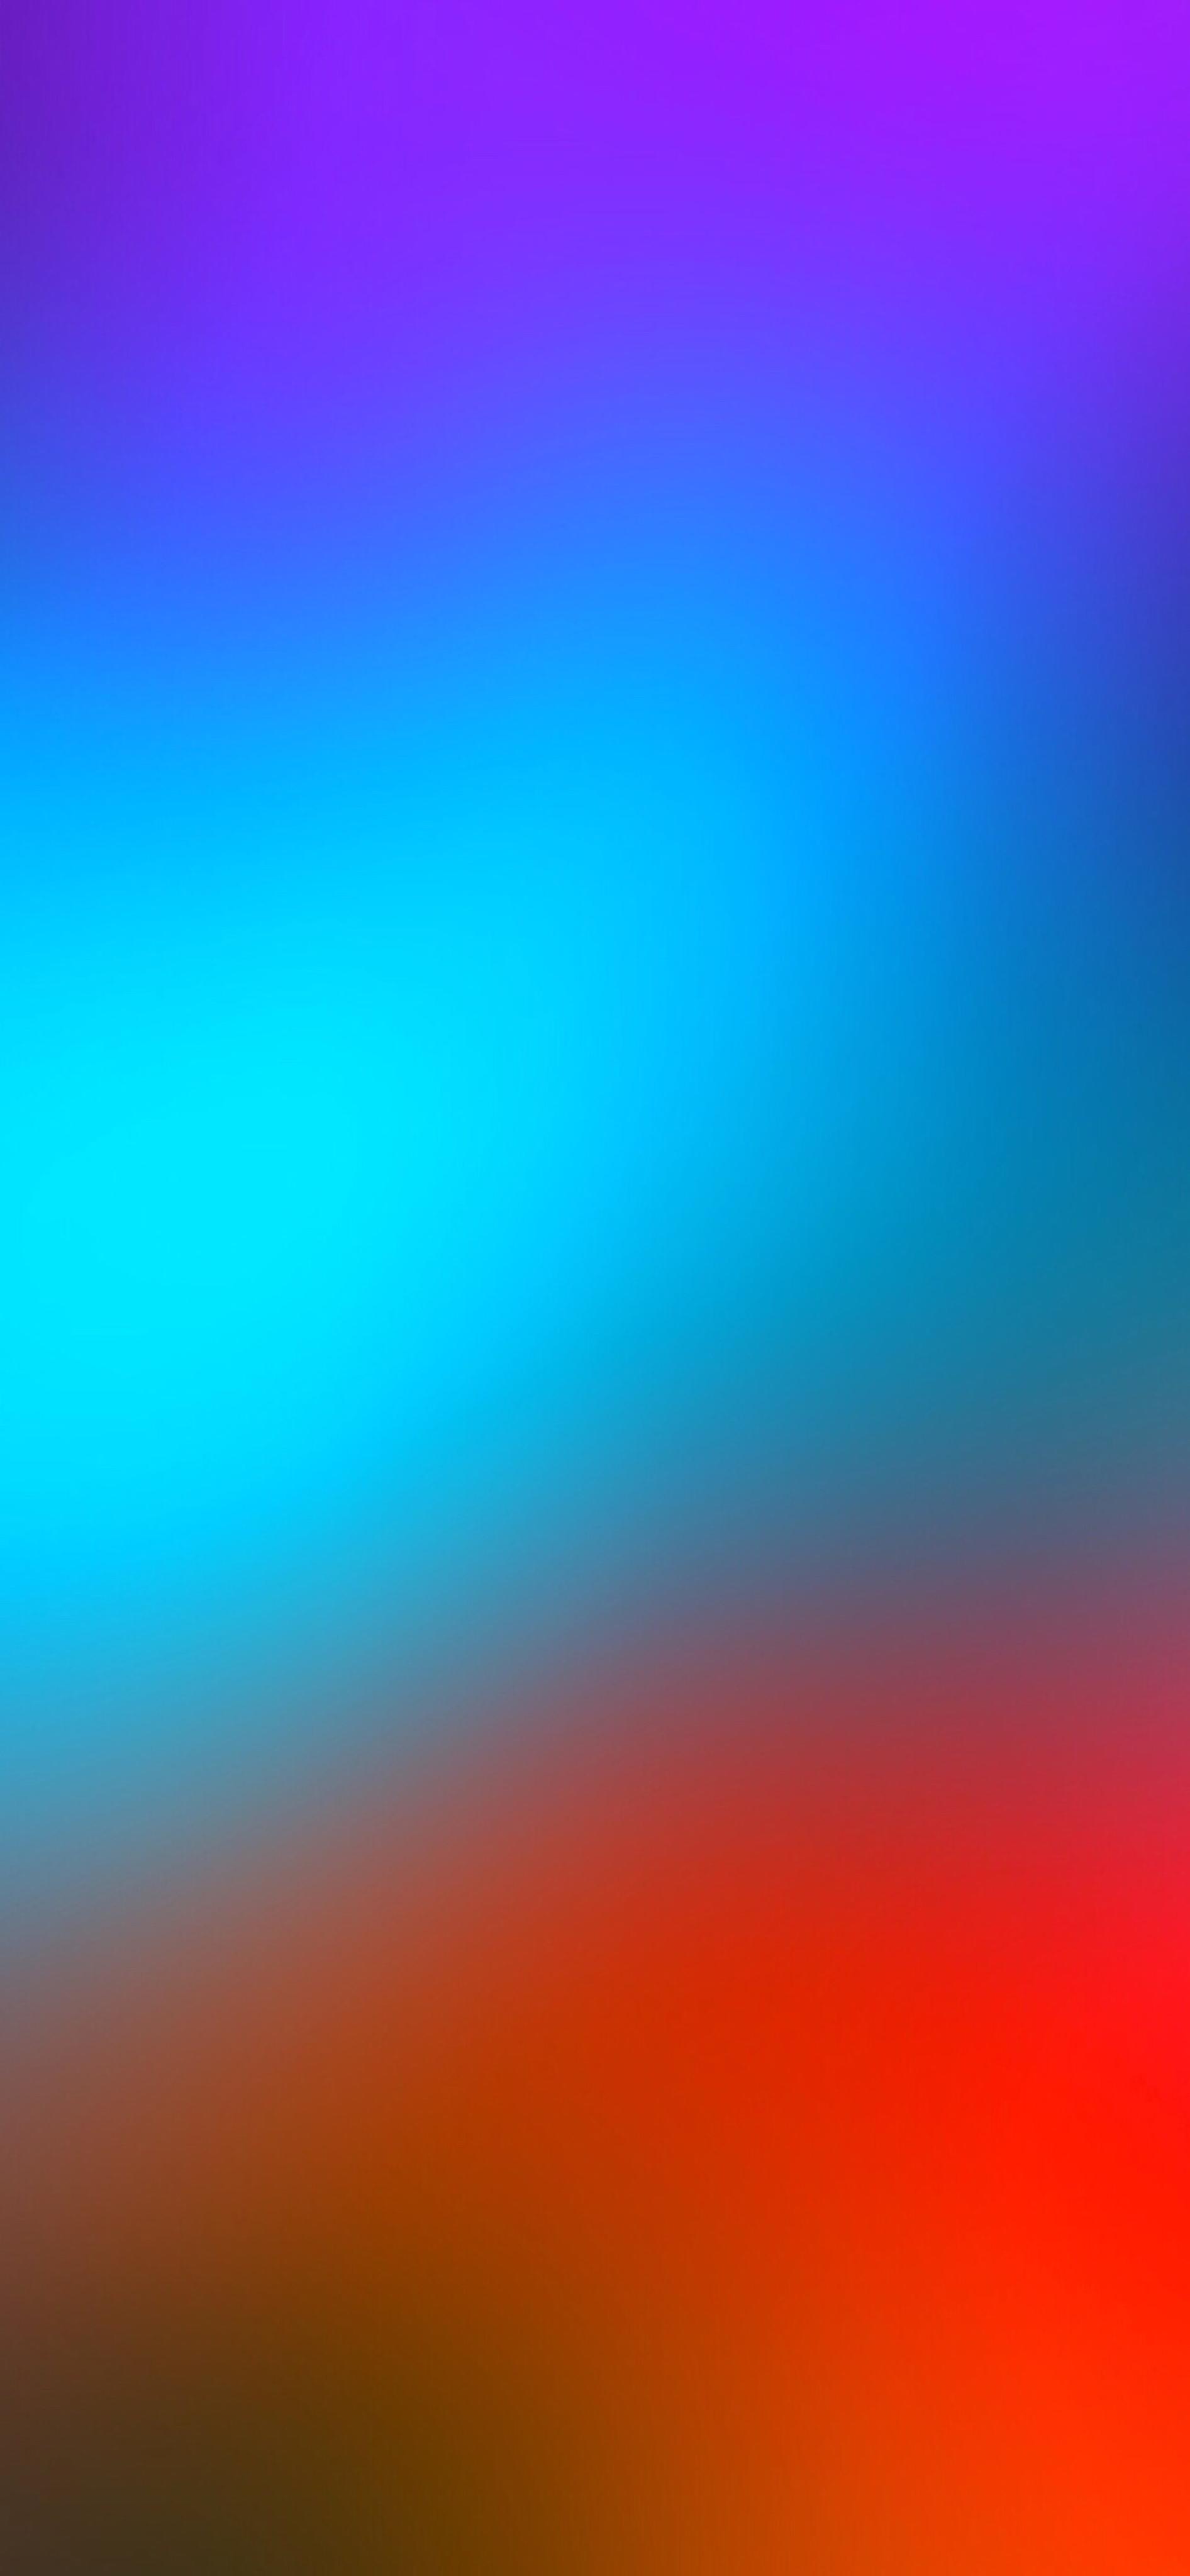 The purple to orange fade via AR72014 Iphone background